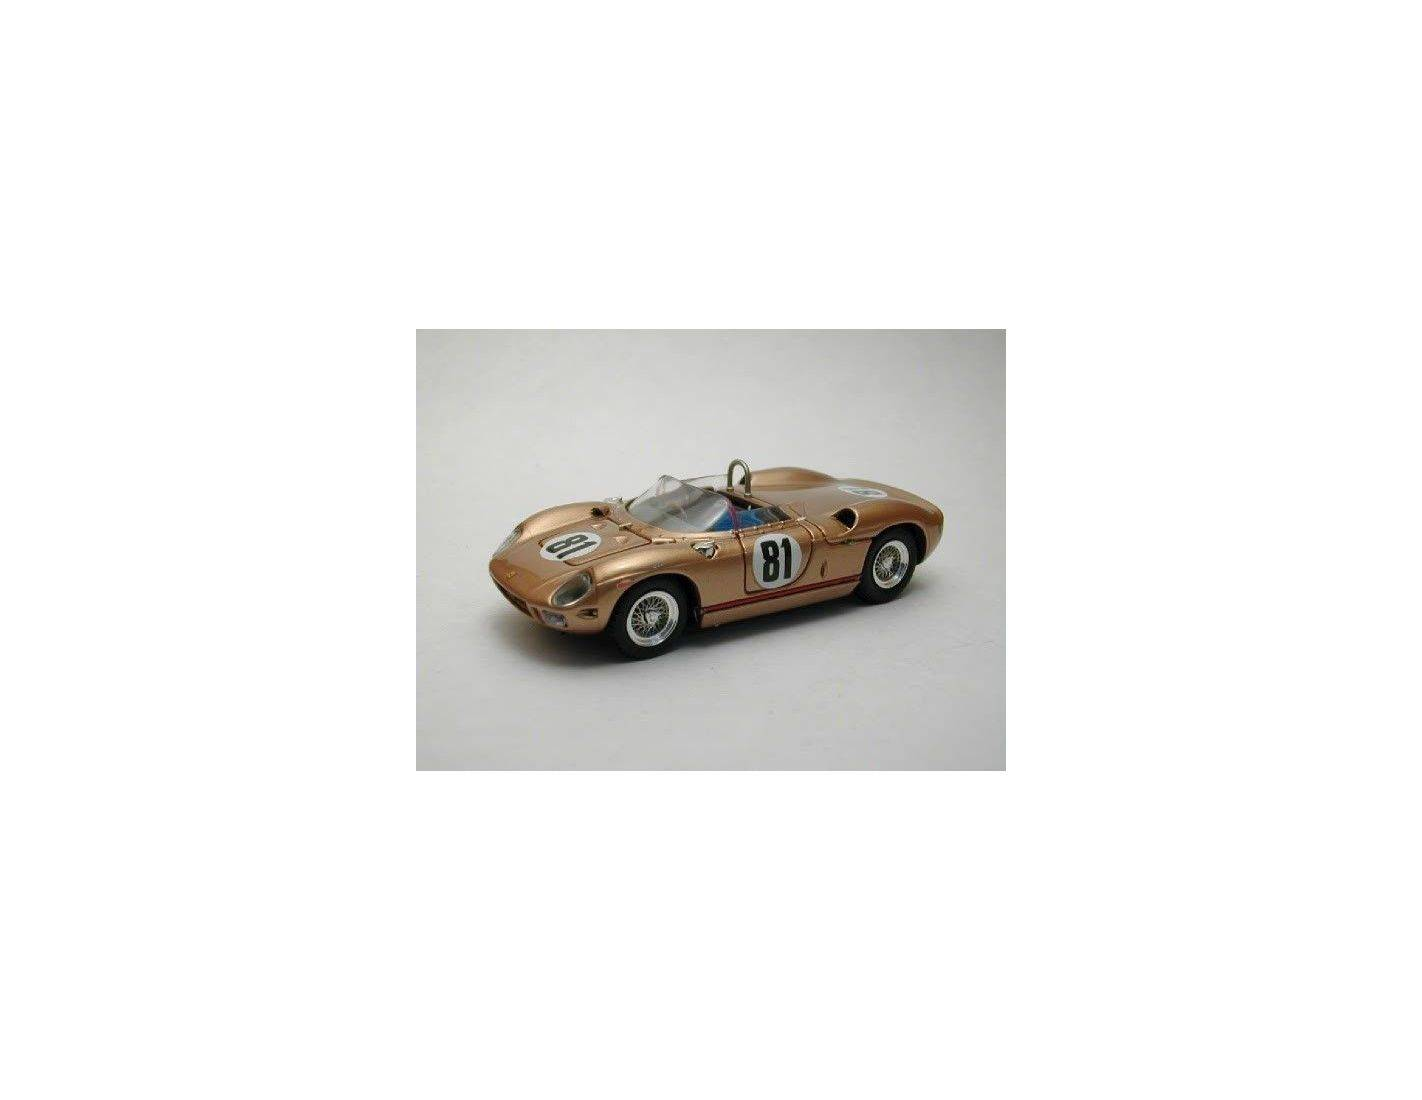 Art Model AM0159 FERRARI 275 P N.81 23rd (4th CLASS) SEBRING 1965 MAIRESSE-BIANCHI 1:43 Modellino